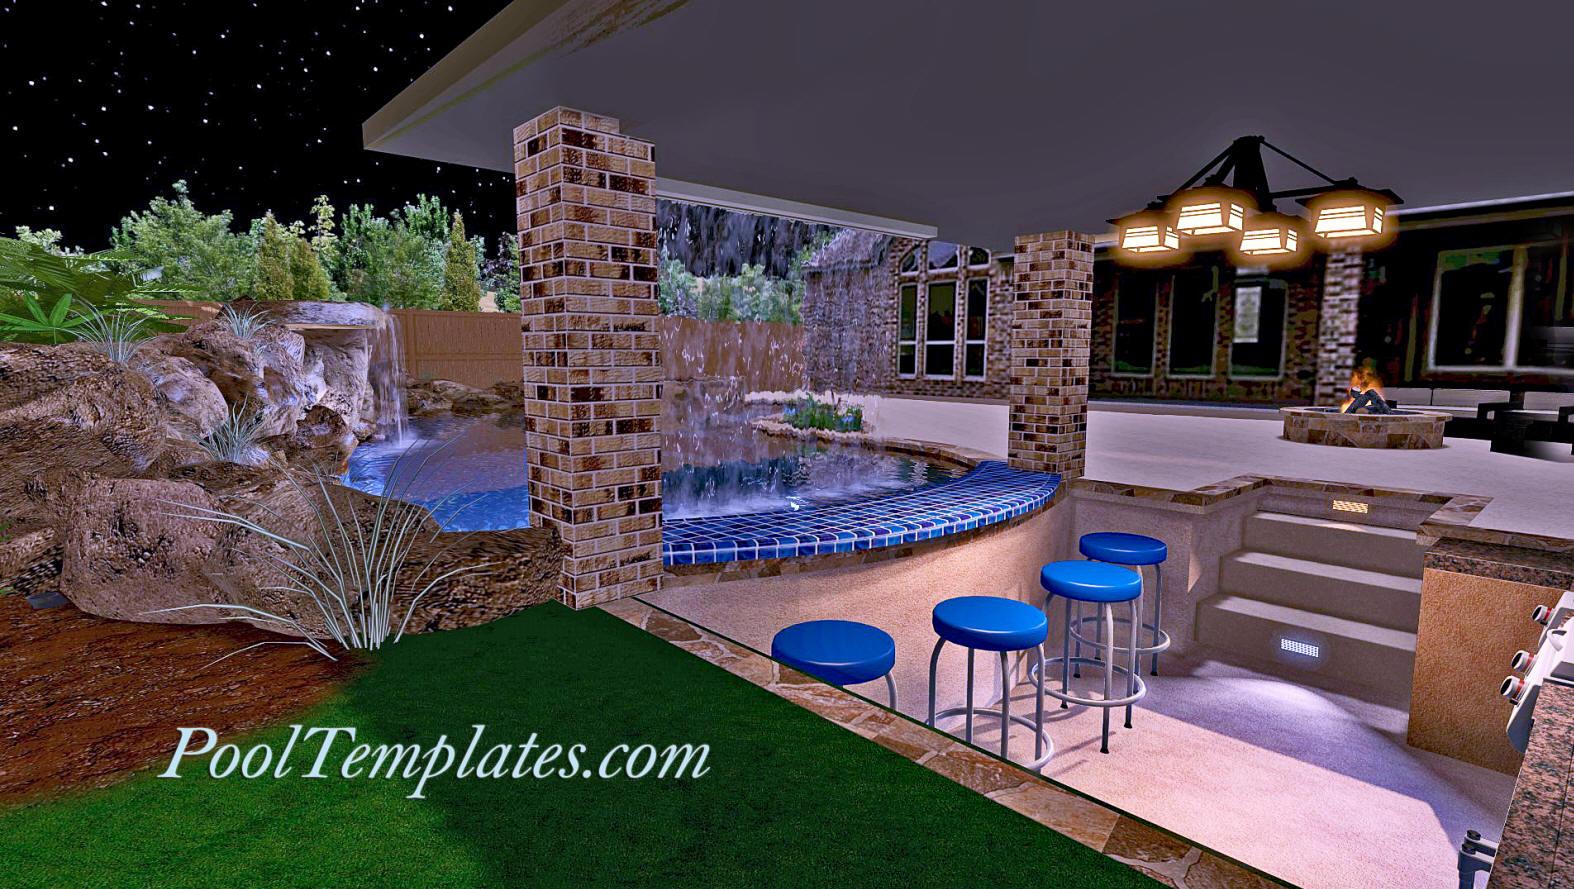 Pool Design Software | PoolTemplates.com